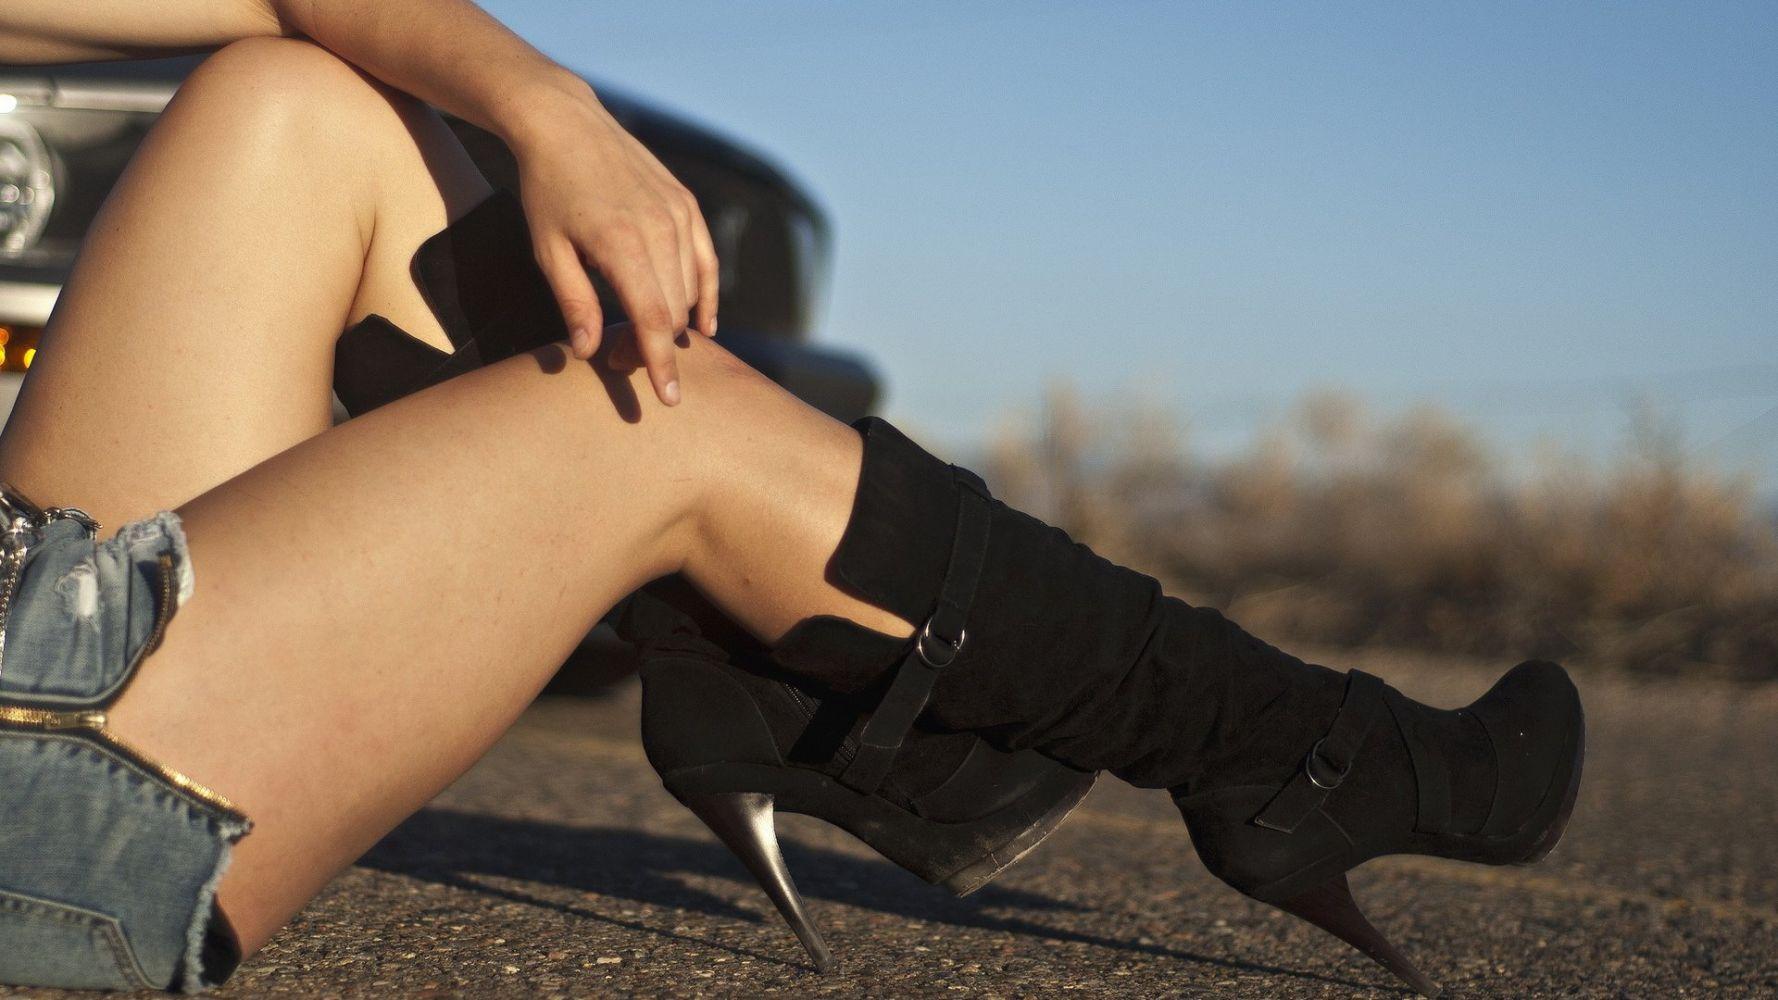 Картинки женских ног красивые на аву